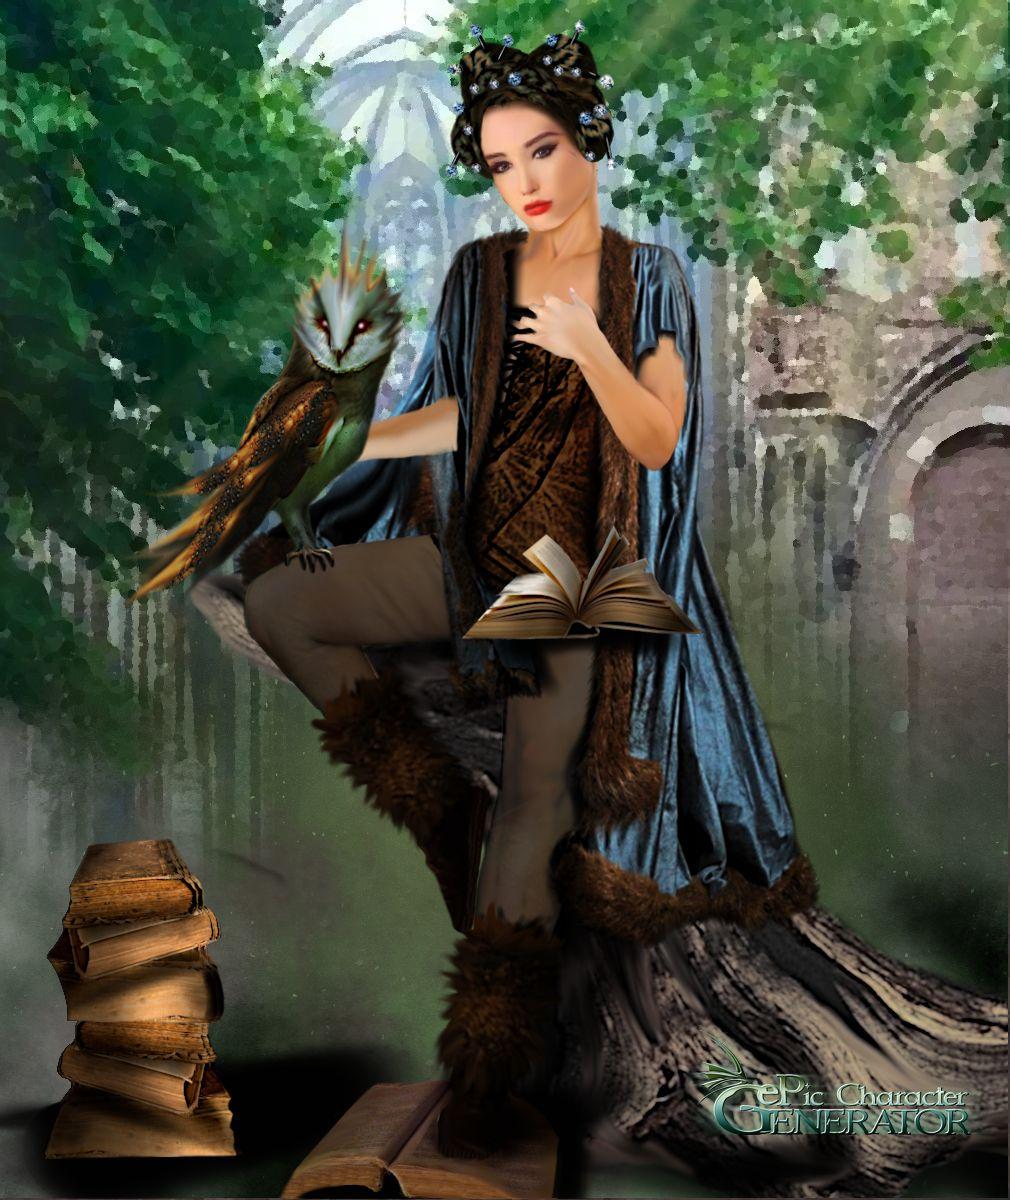 ePic Character Generator Season 3 Throne Lady 2 Screenshot 3